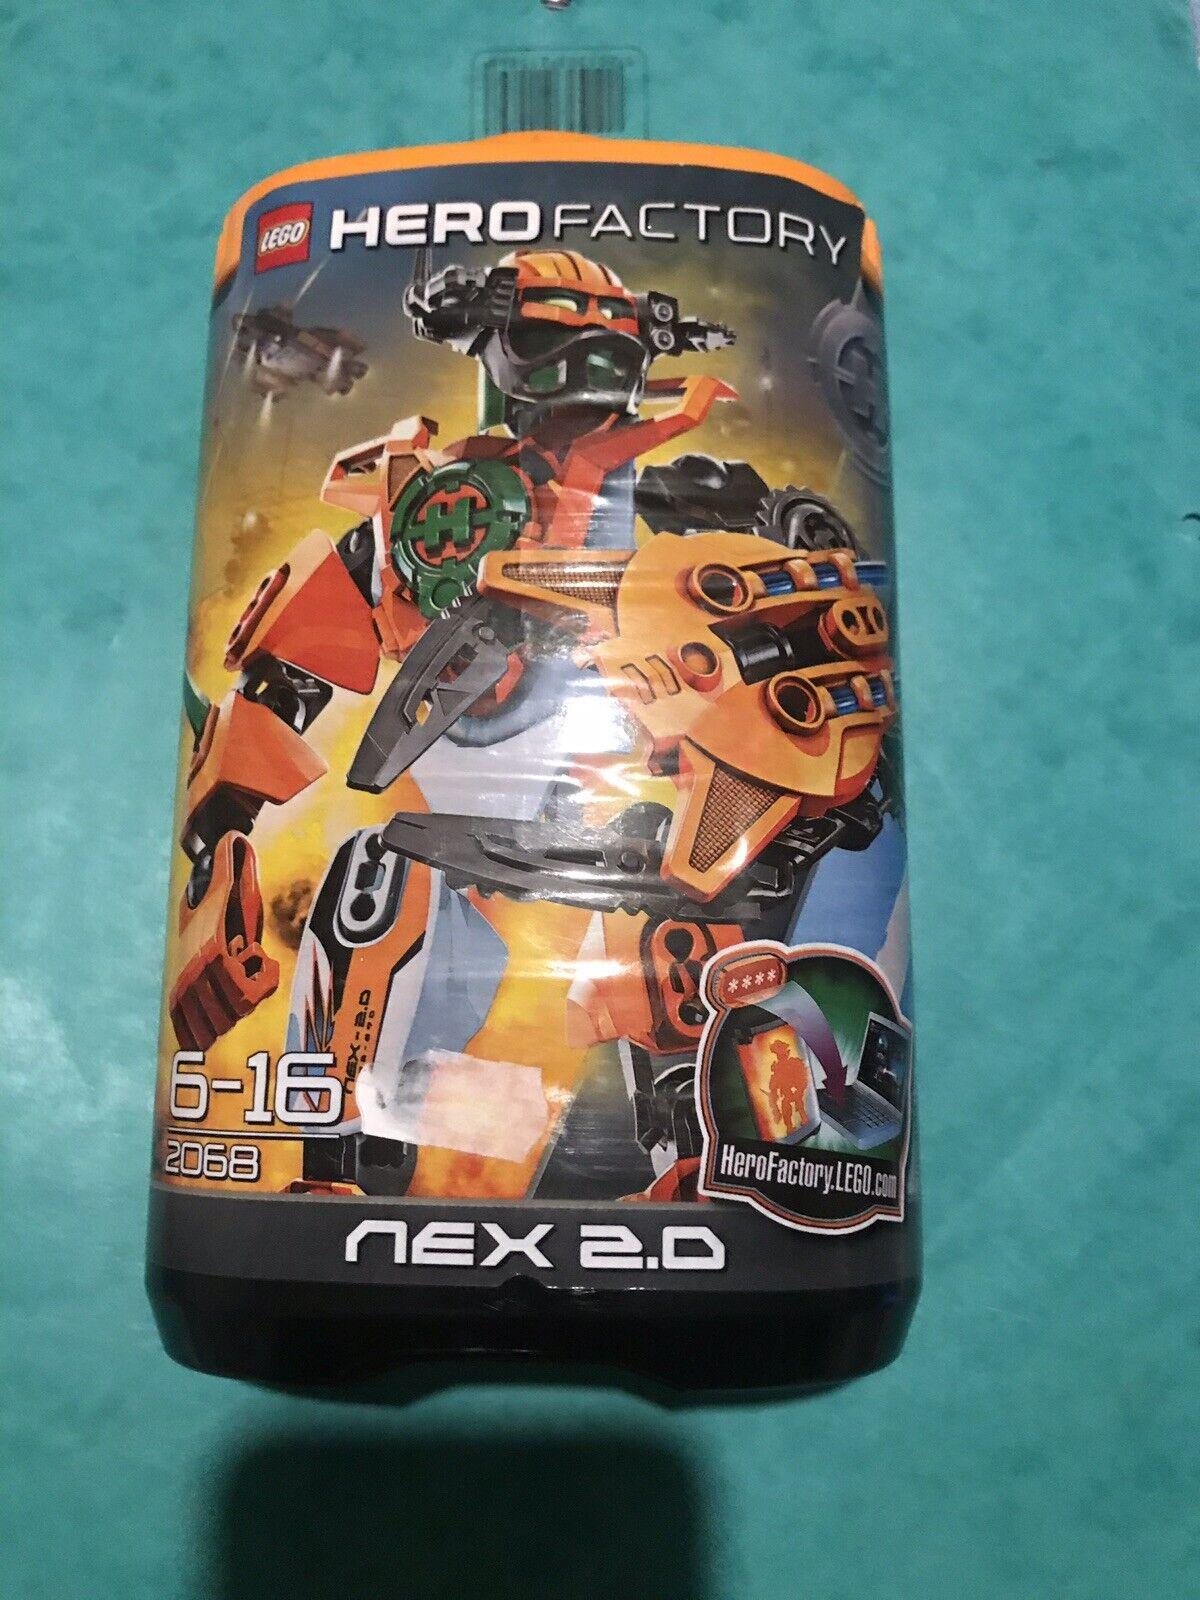 LEGO 2068 Nex 2.0 2011 Hero Factory Hero Rare Retirot Ordeal Of Fire Julius Nex